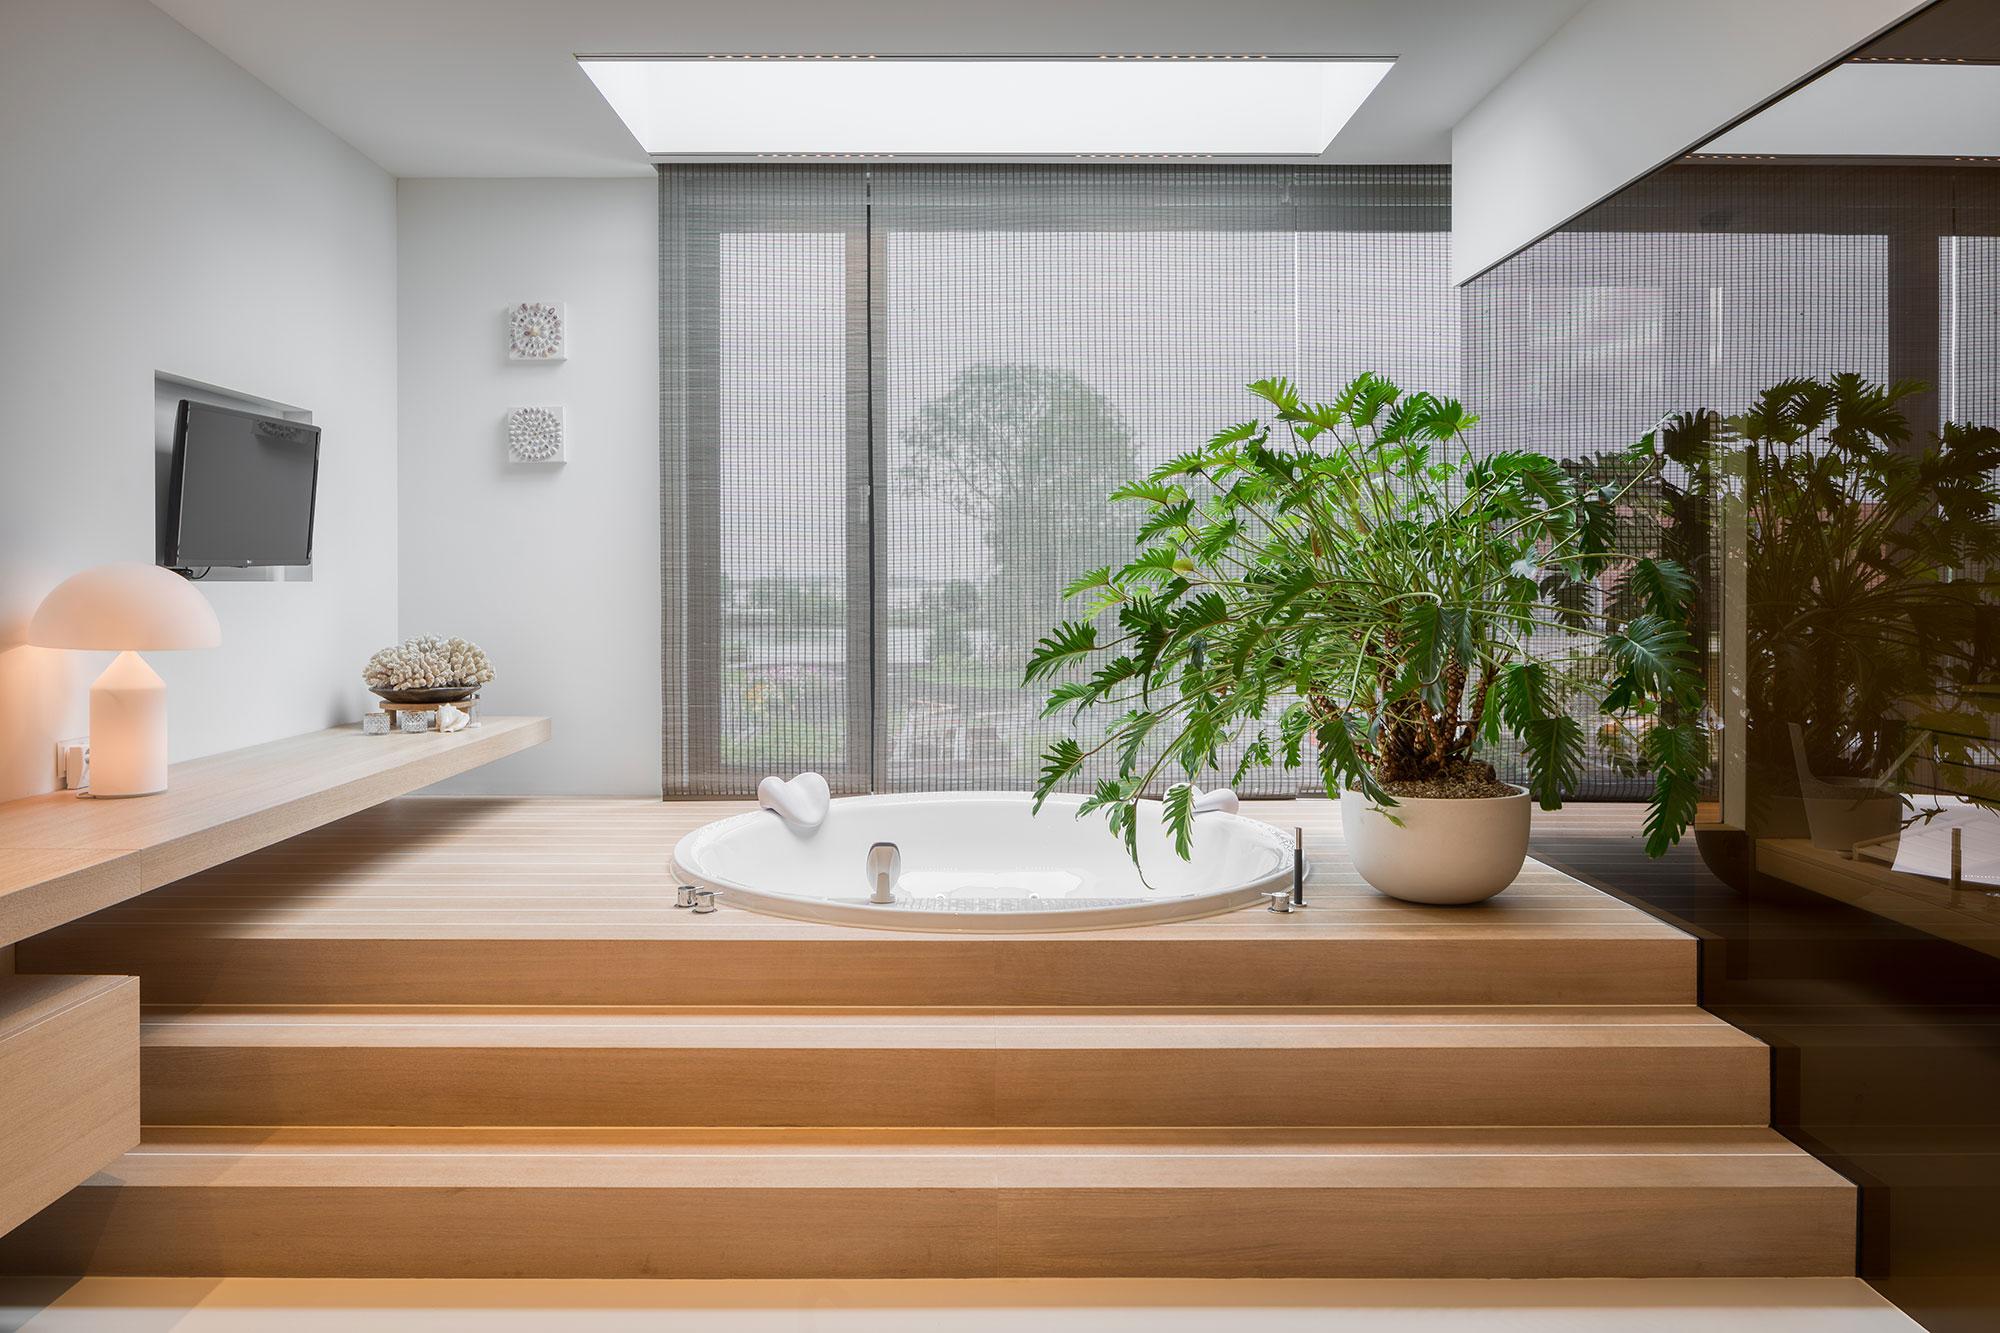 interieurarchitectuur badkamer